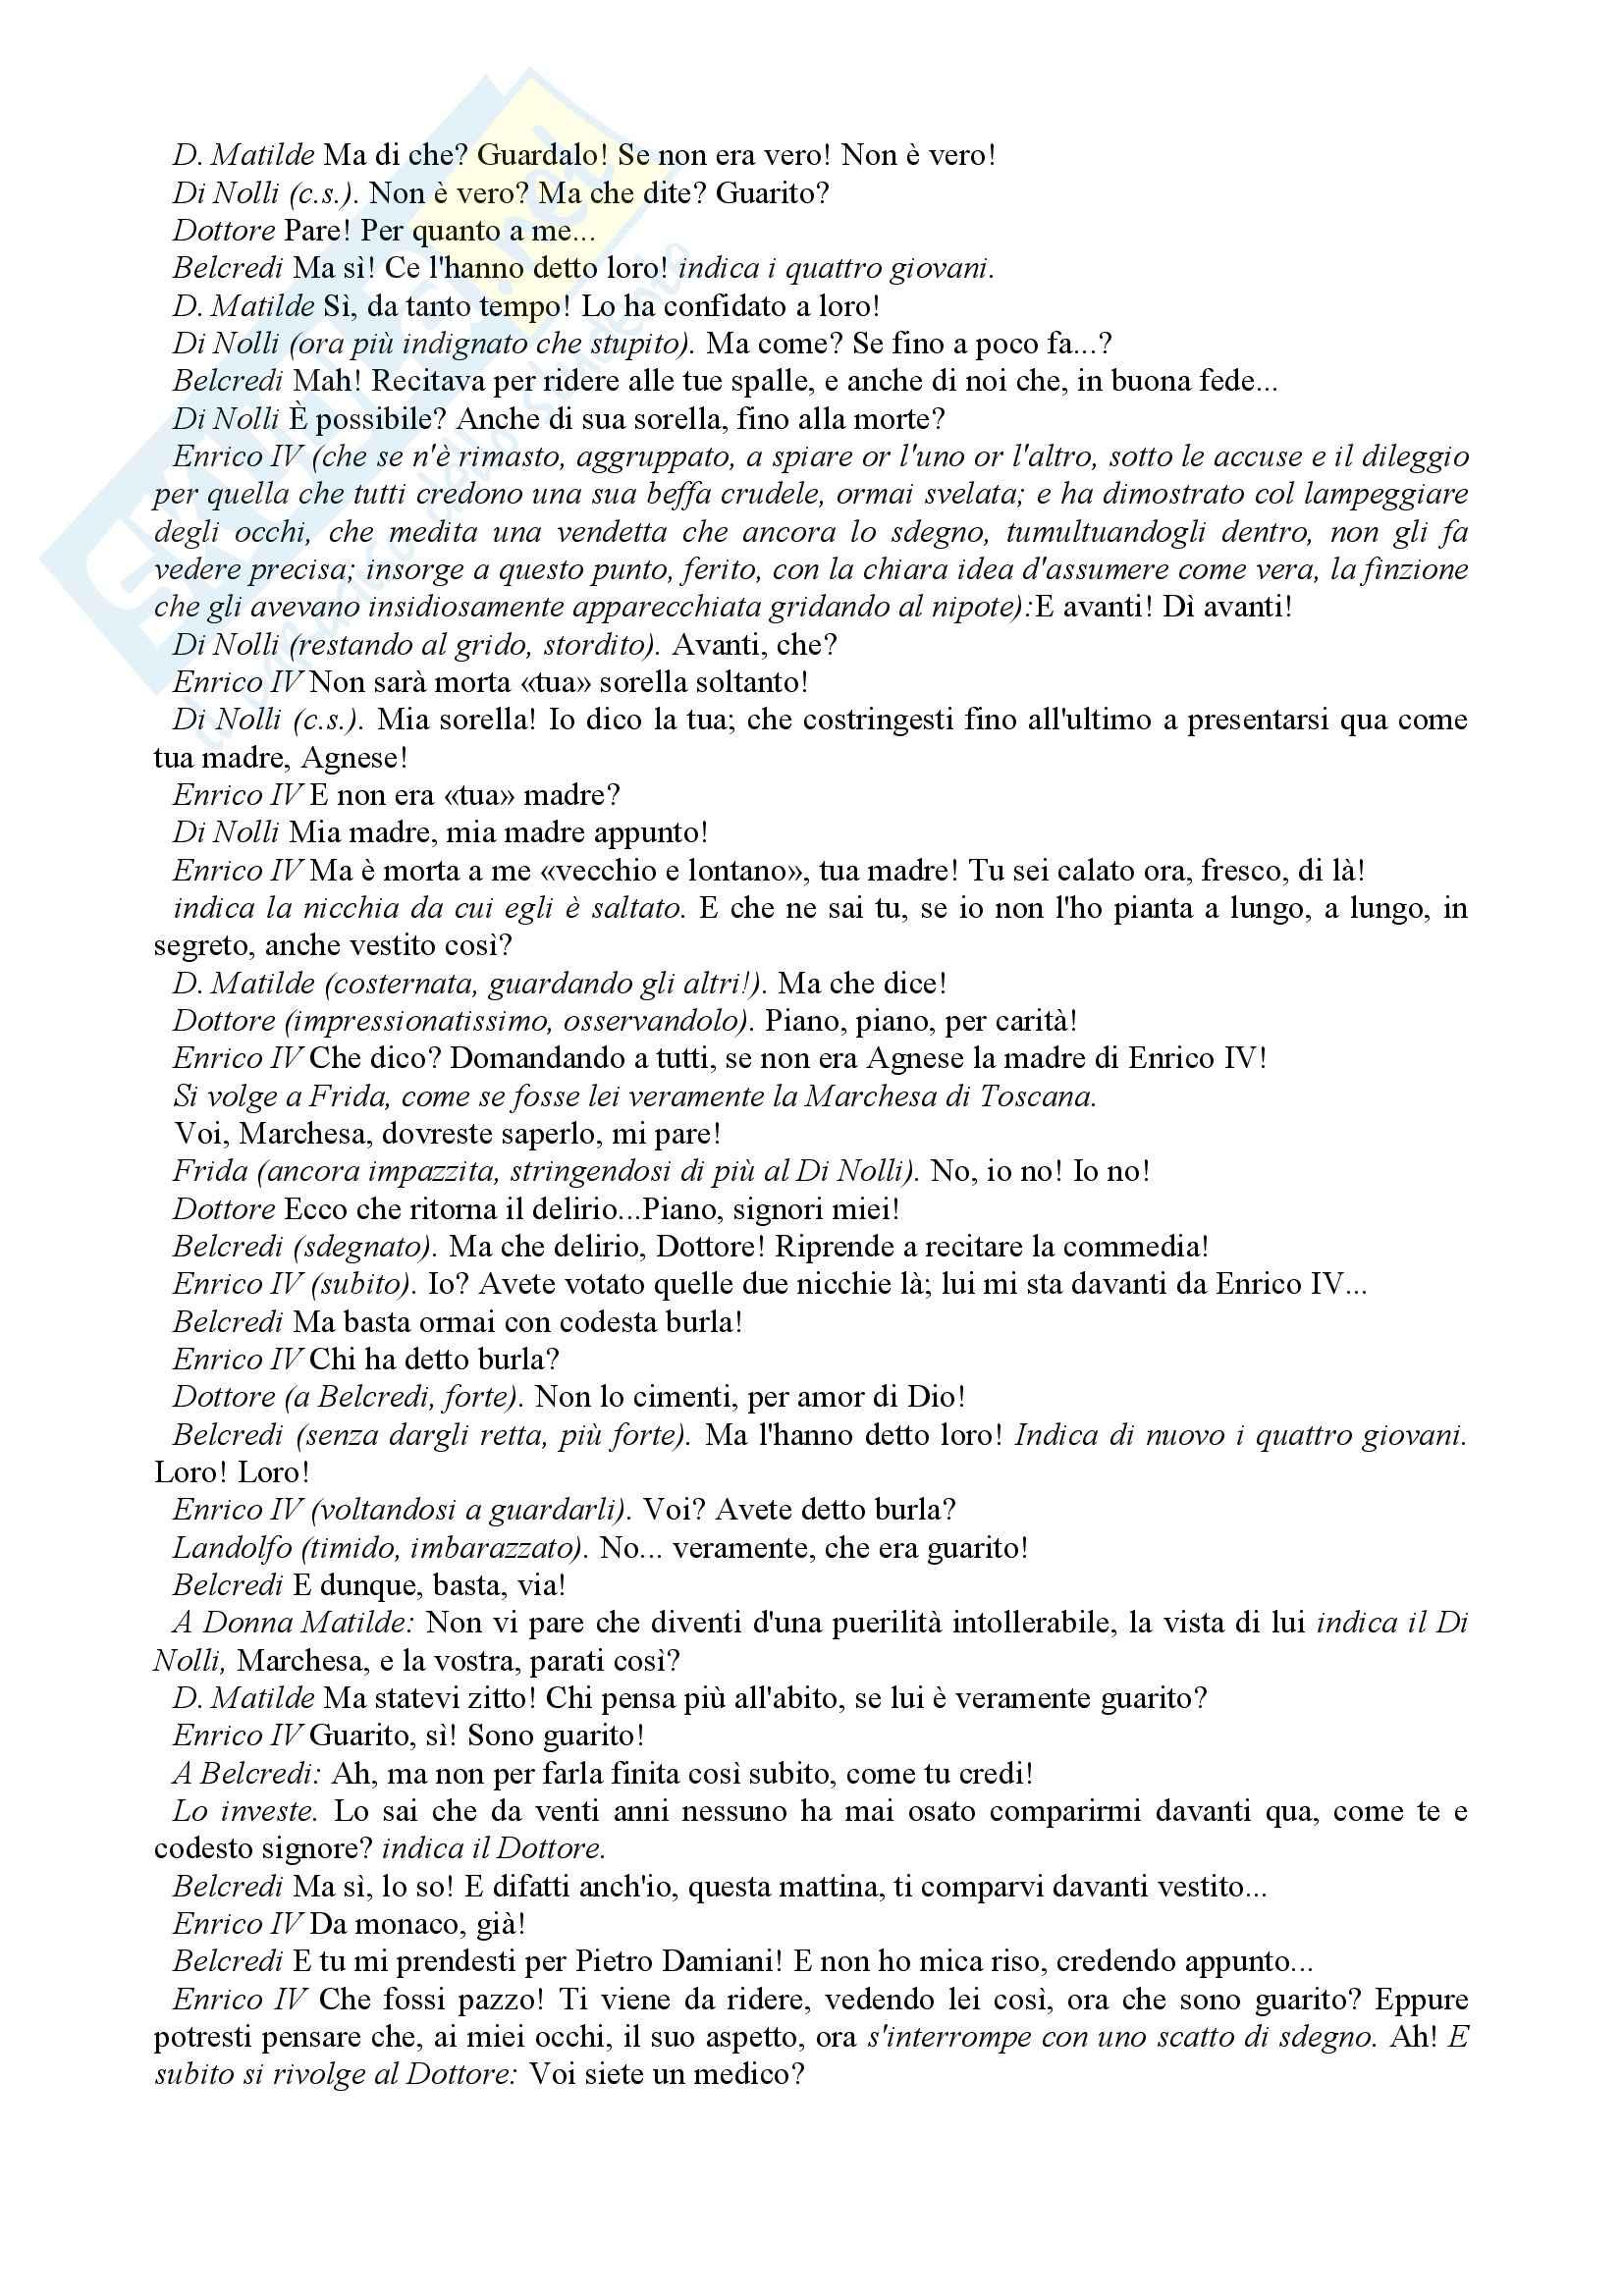 Letteratura teatrale italiana - Enrico IV Pag. 31